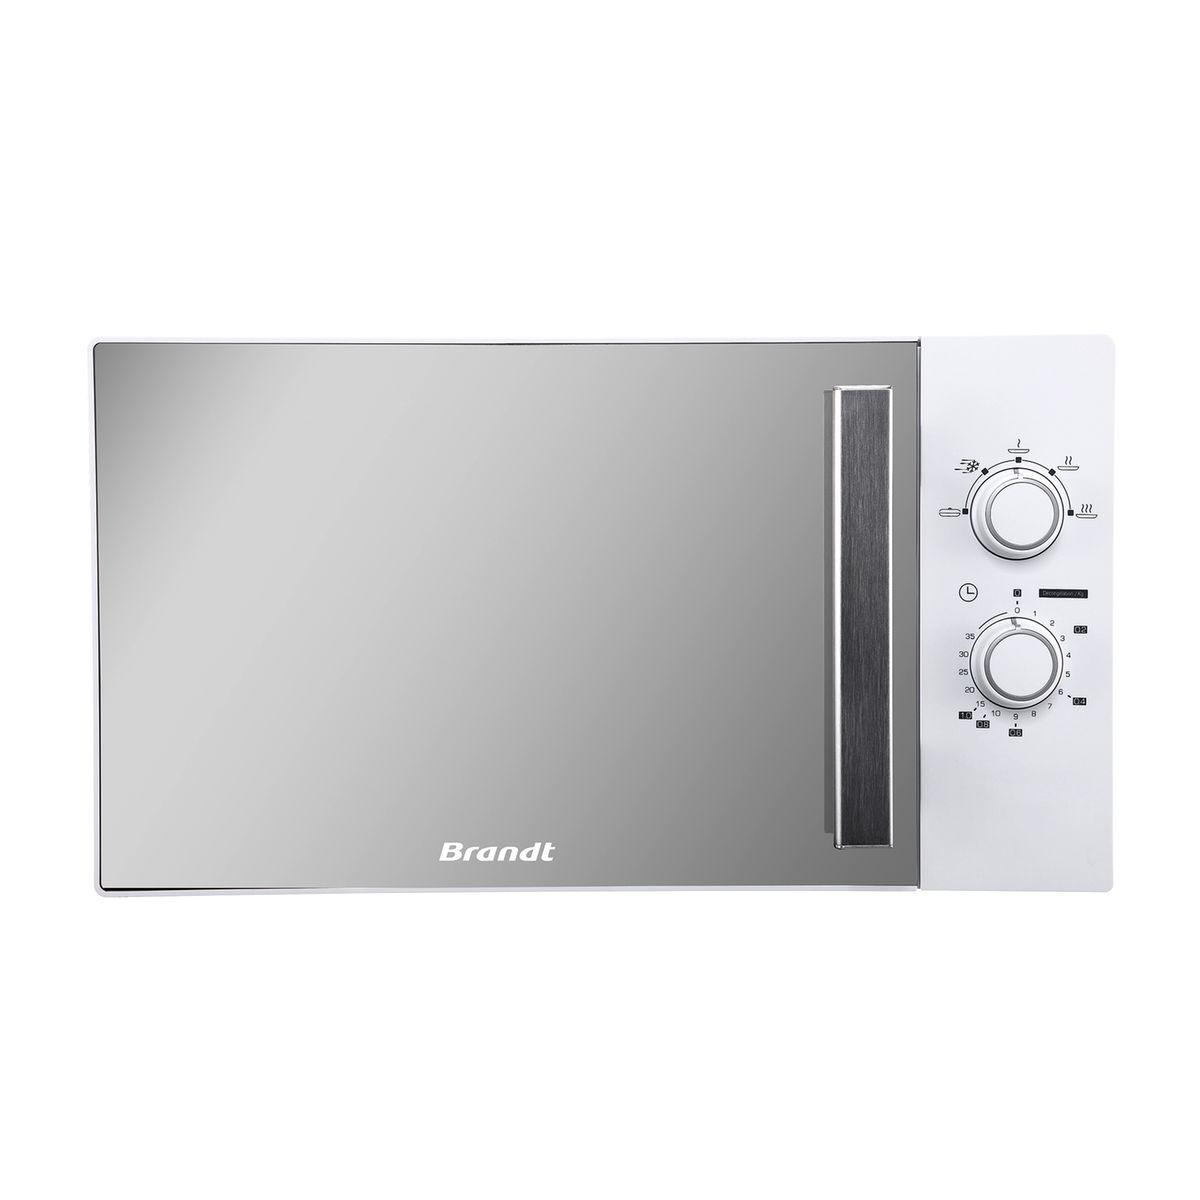 Brandt Micro-ondes monofonction SM2606W - BRANDT